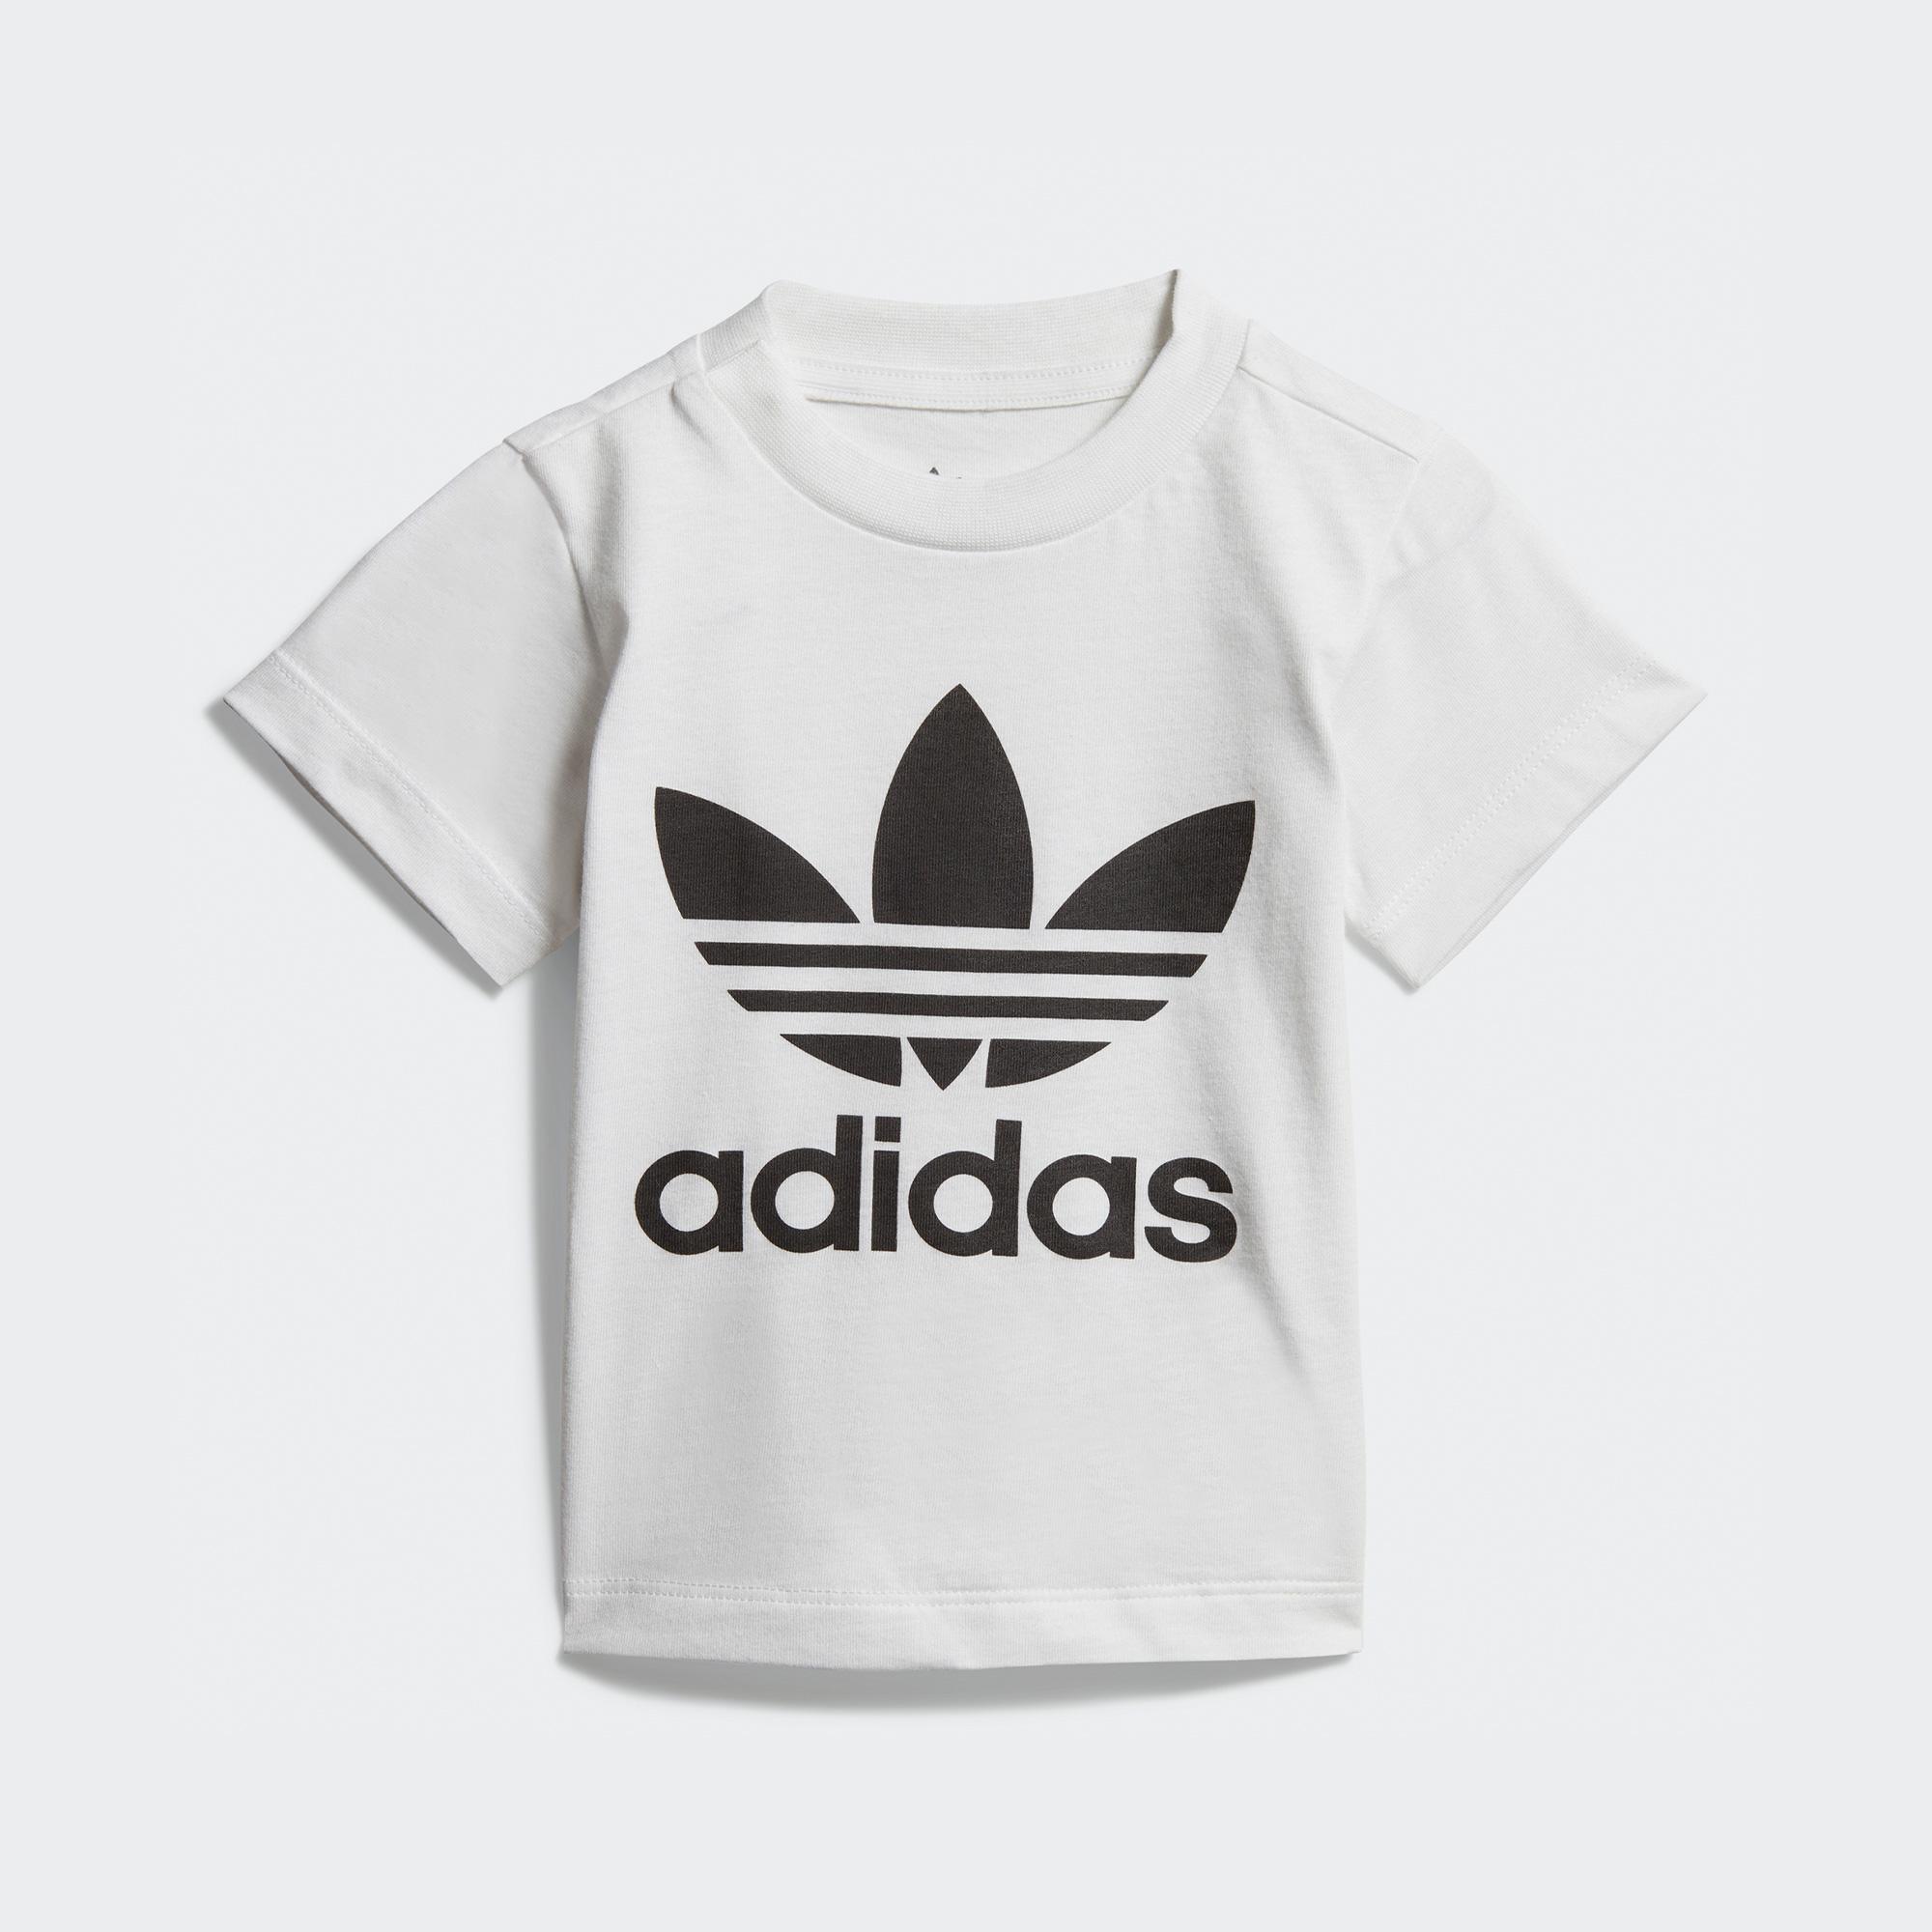 adidas Trefoil Bebek Beyaz T-Shirt